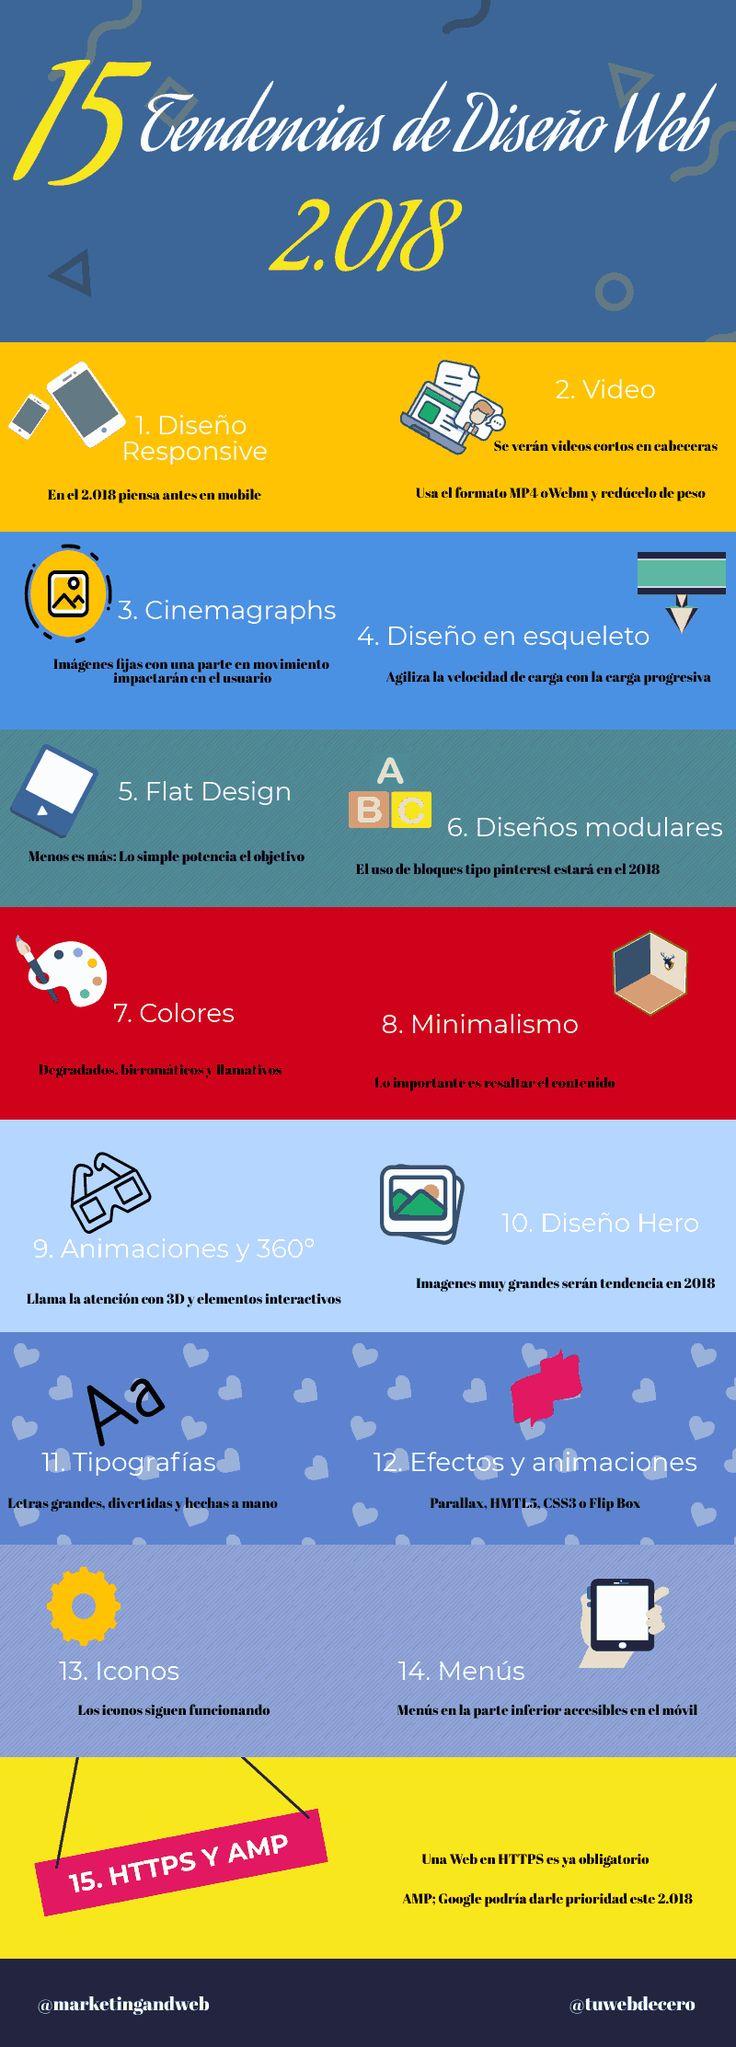 15 tendencias en diseño web #infografia